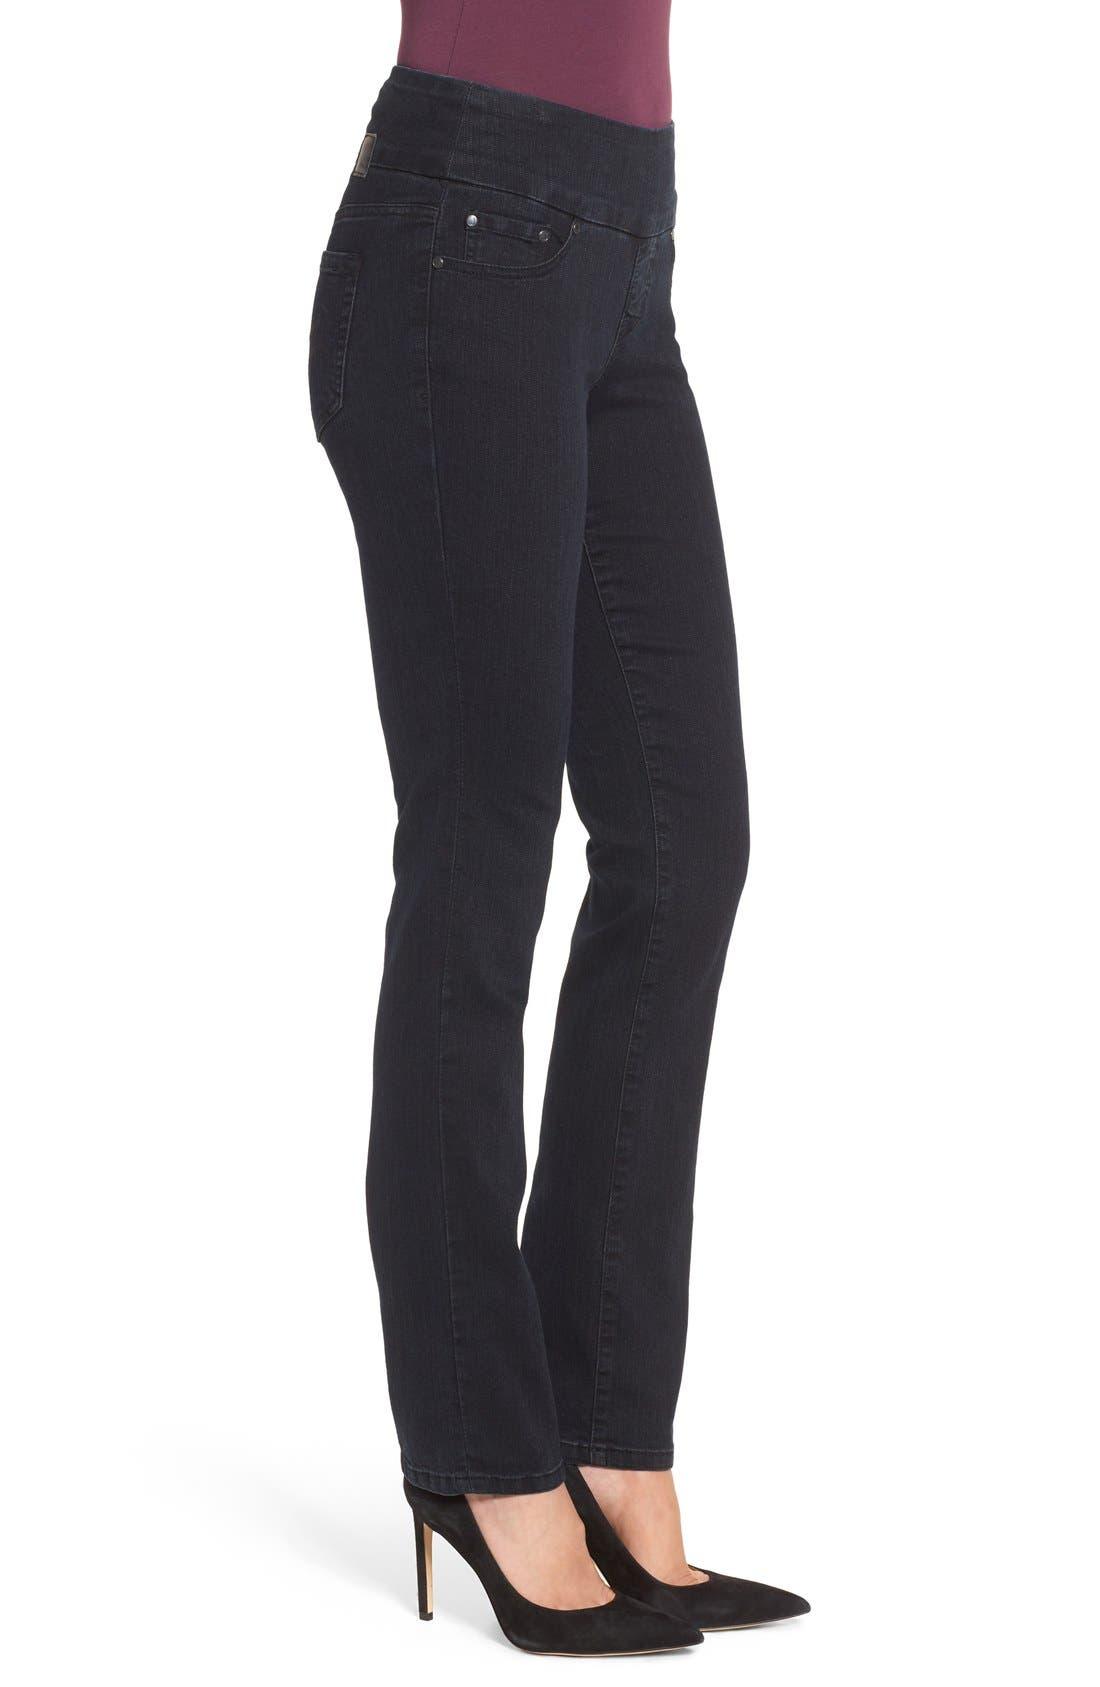 'Peri' Straight Leg Pull-On Jeans,                             Alternate thumbnail 4, color,                             001